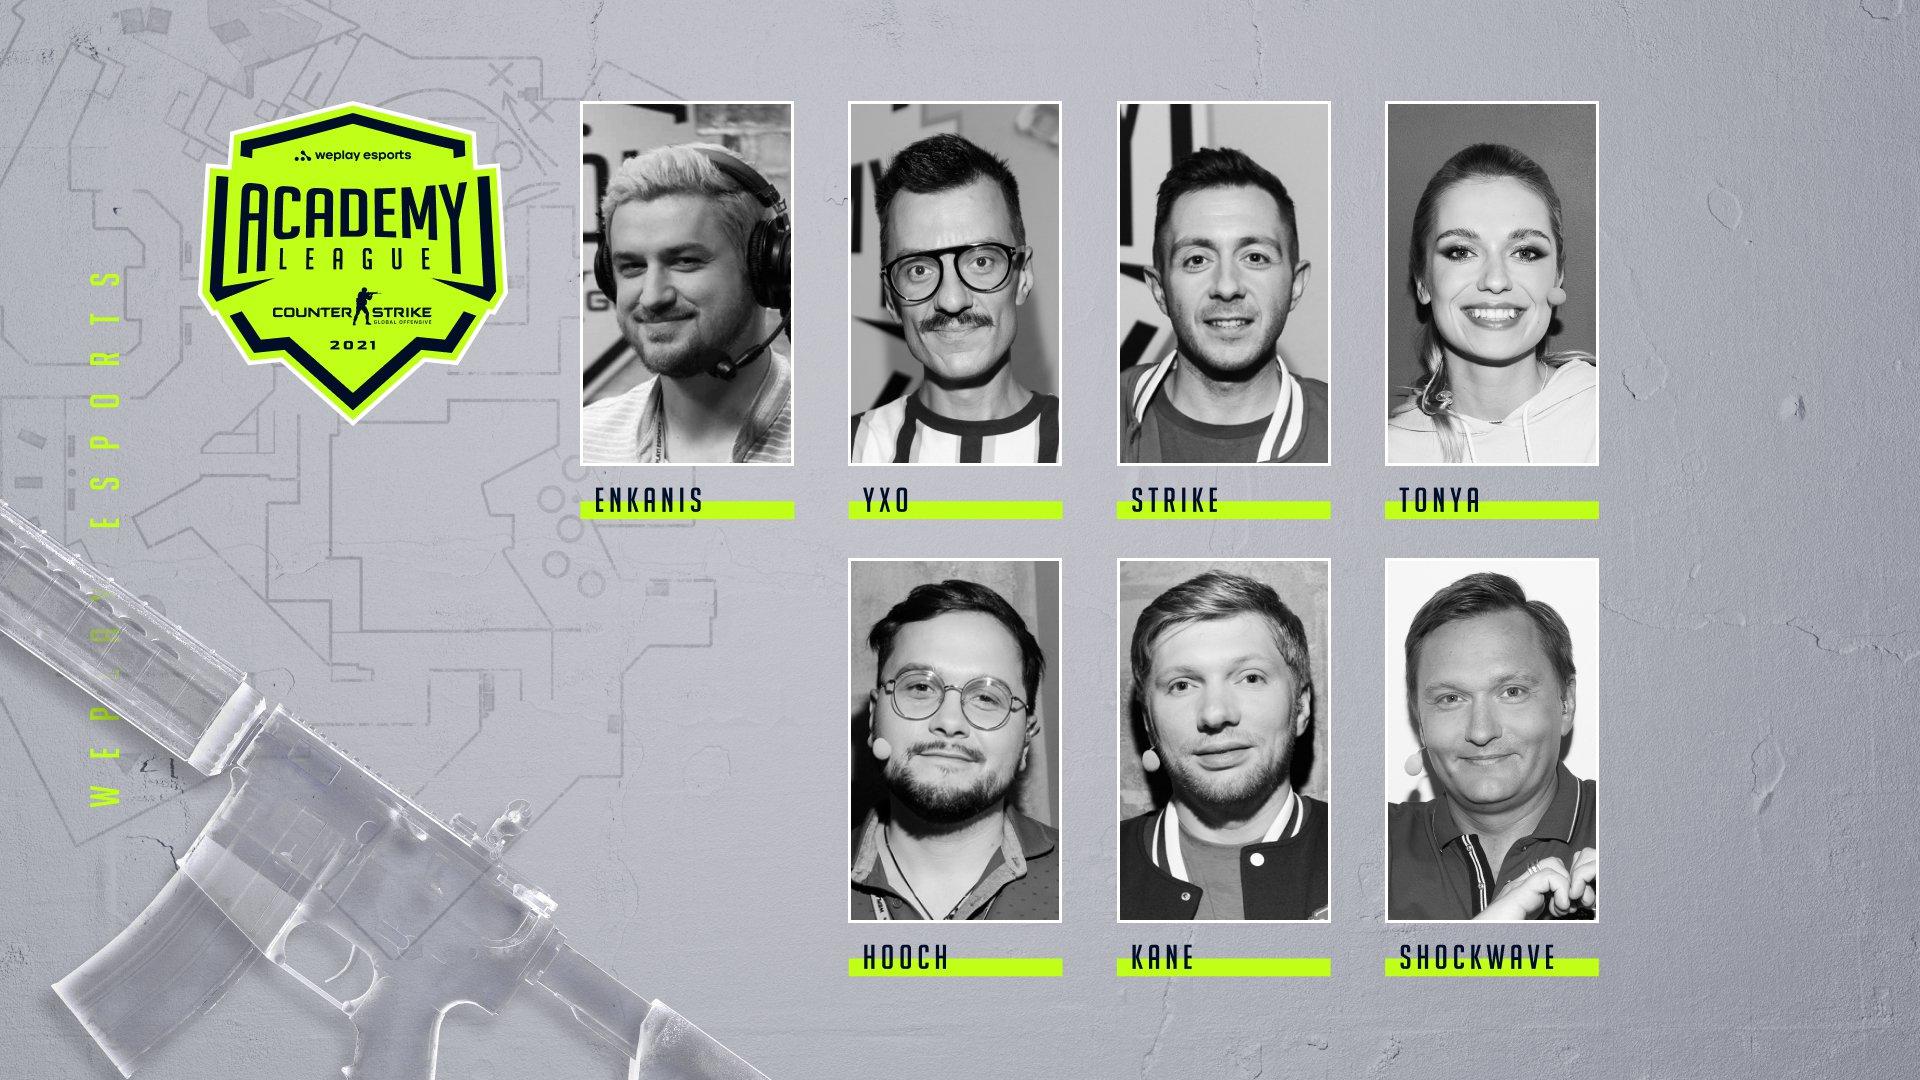 Русскоязычная команда талантов WePlay Academy League Season 2. Изображение: WePlay Holding